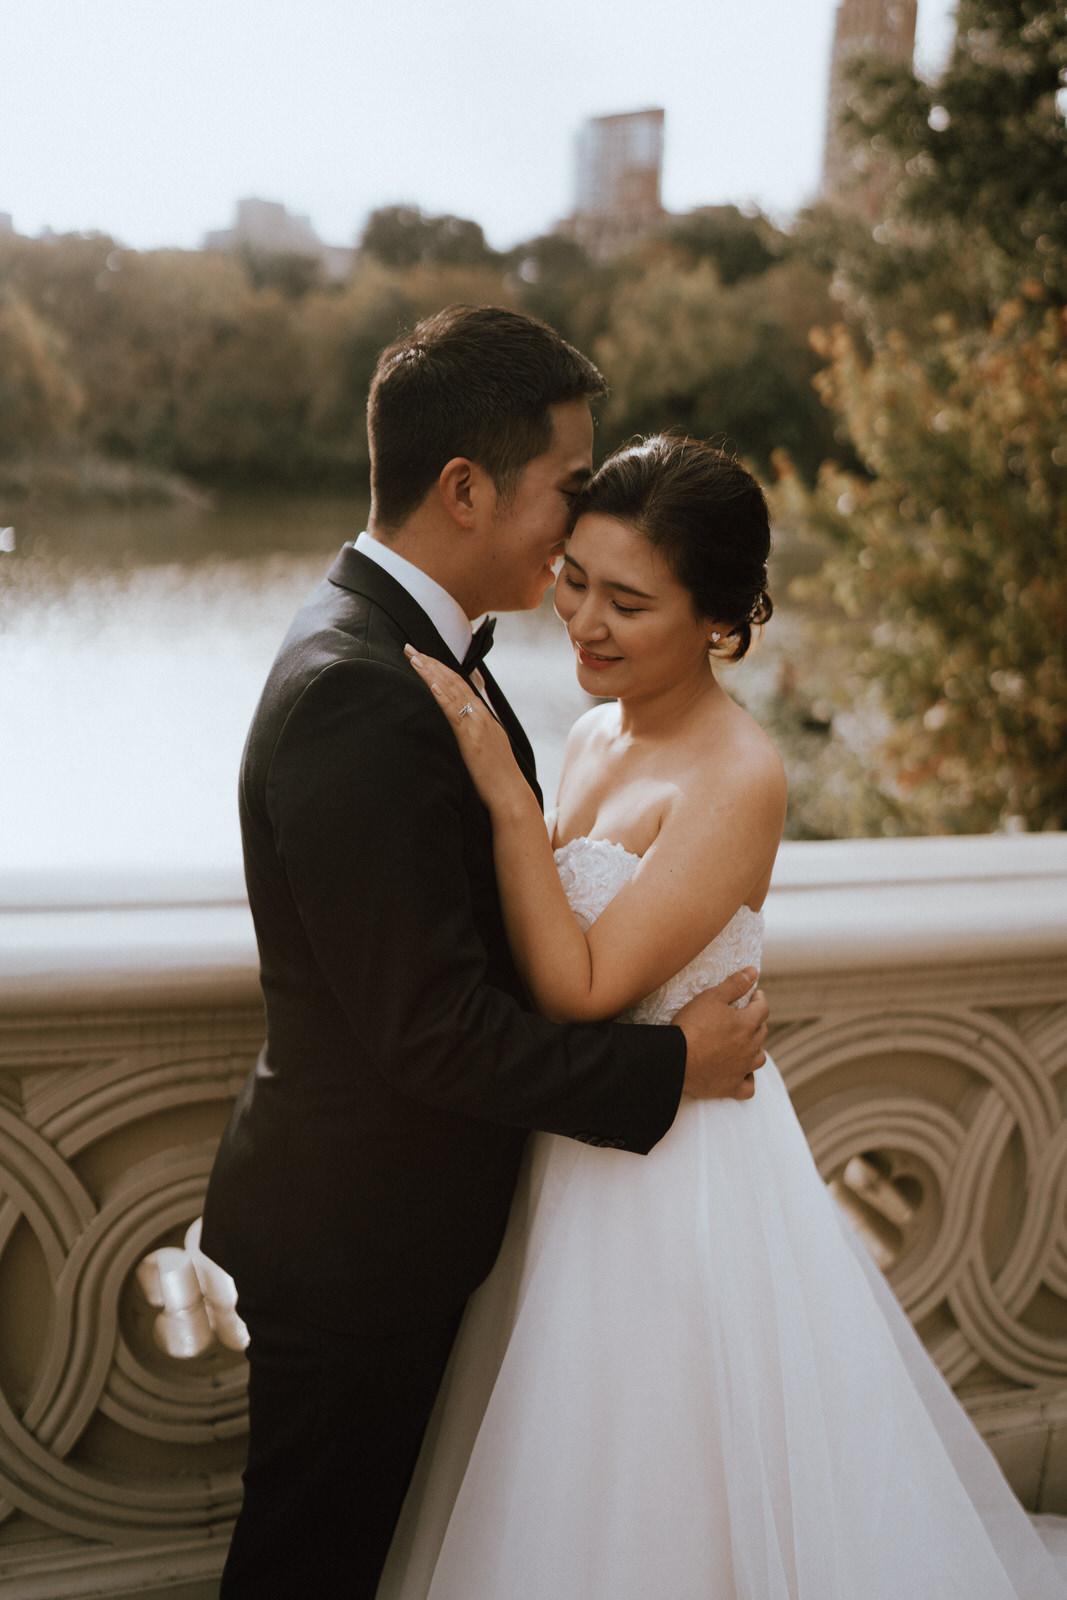 Central Park Elopement Photos-Bow Bridge-Michelle Gonzalez Photography- New York Wedding Photographer-45.jpg